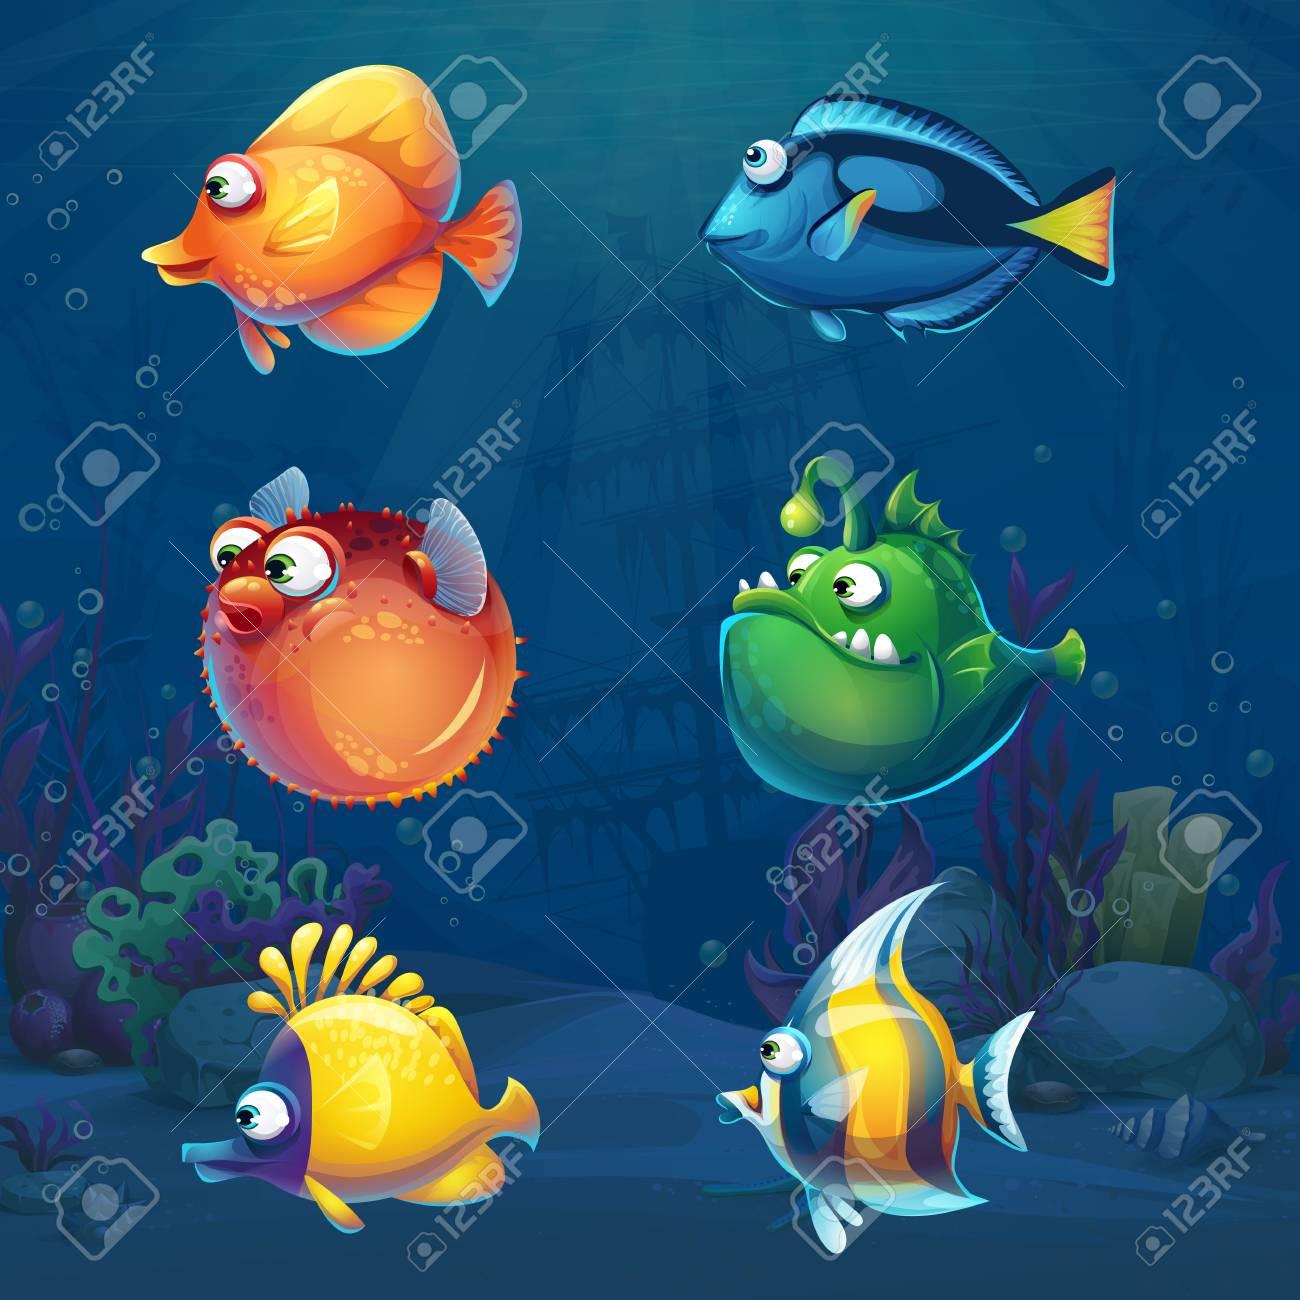 Set of cartoon funny fish in underwater world - 104302077